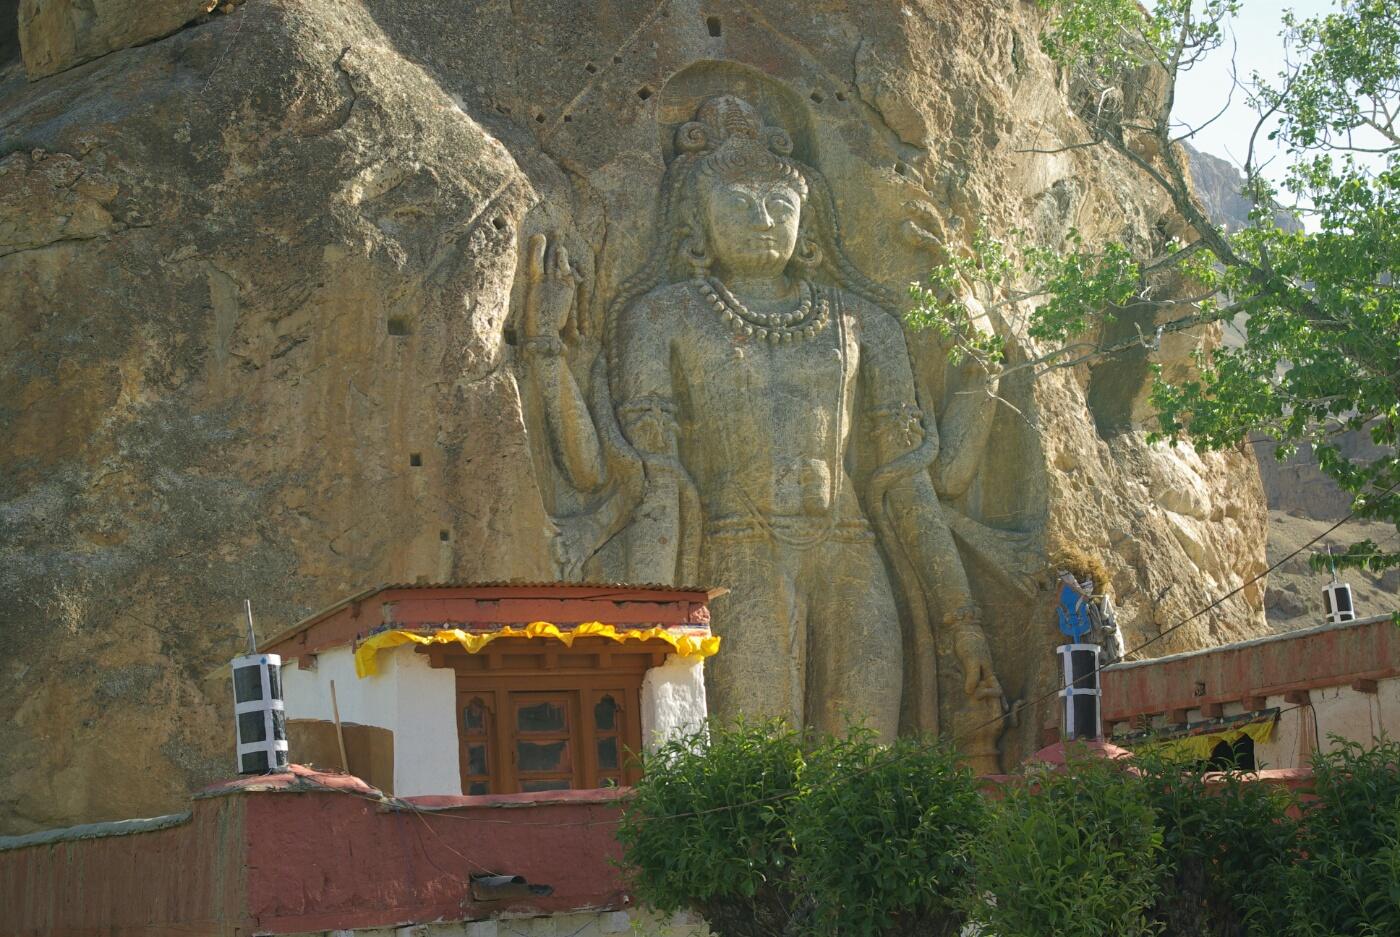 Unterwegs nach Wakha: 9 m hohe Buddha Statue aus dem 8. Jhd. Nähe Mulbek.